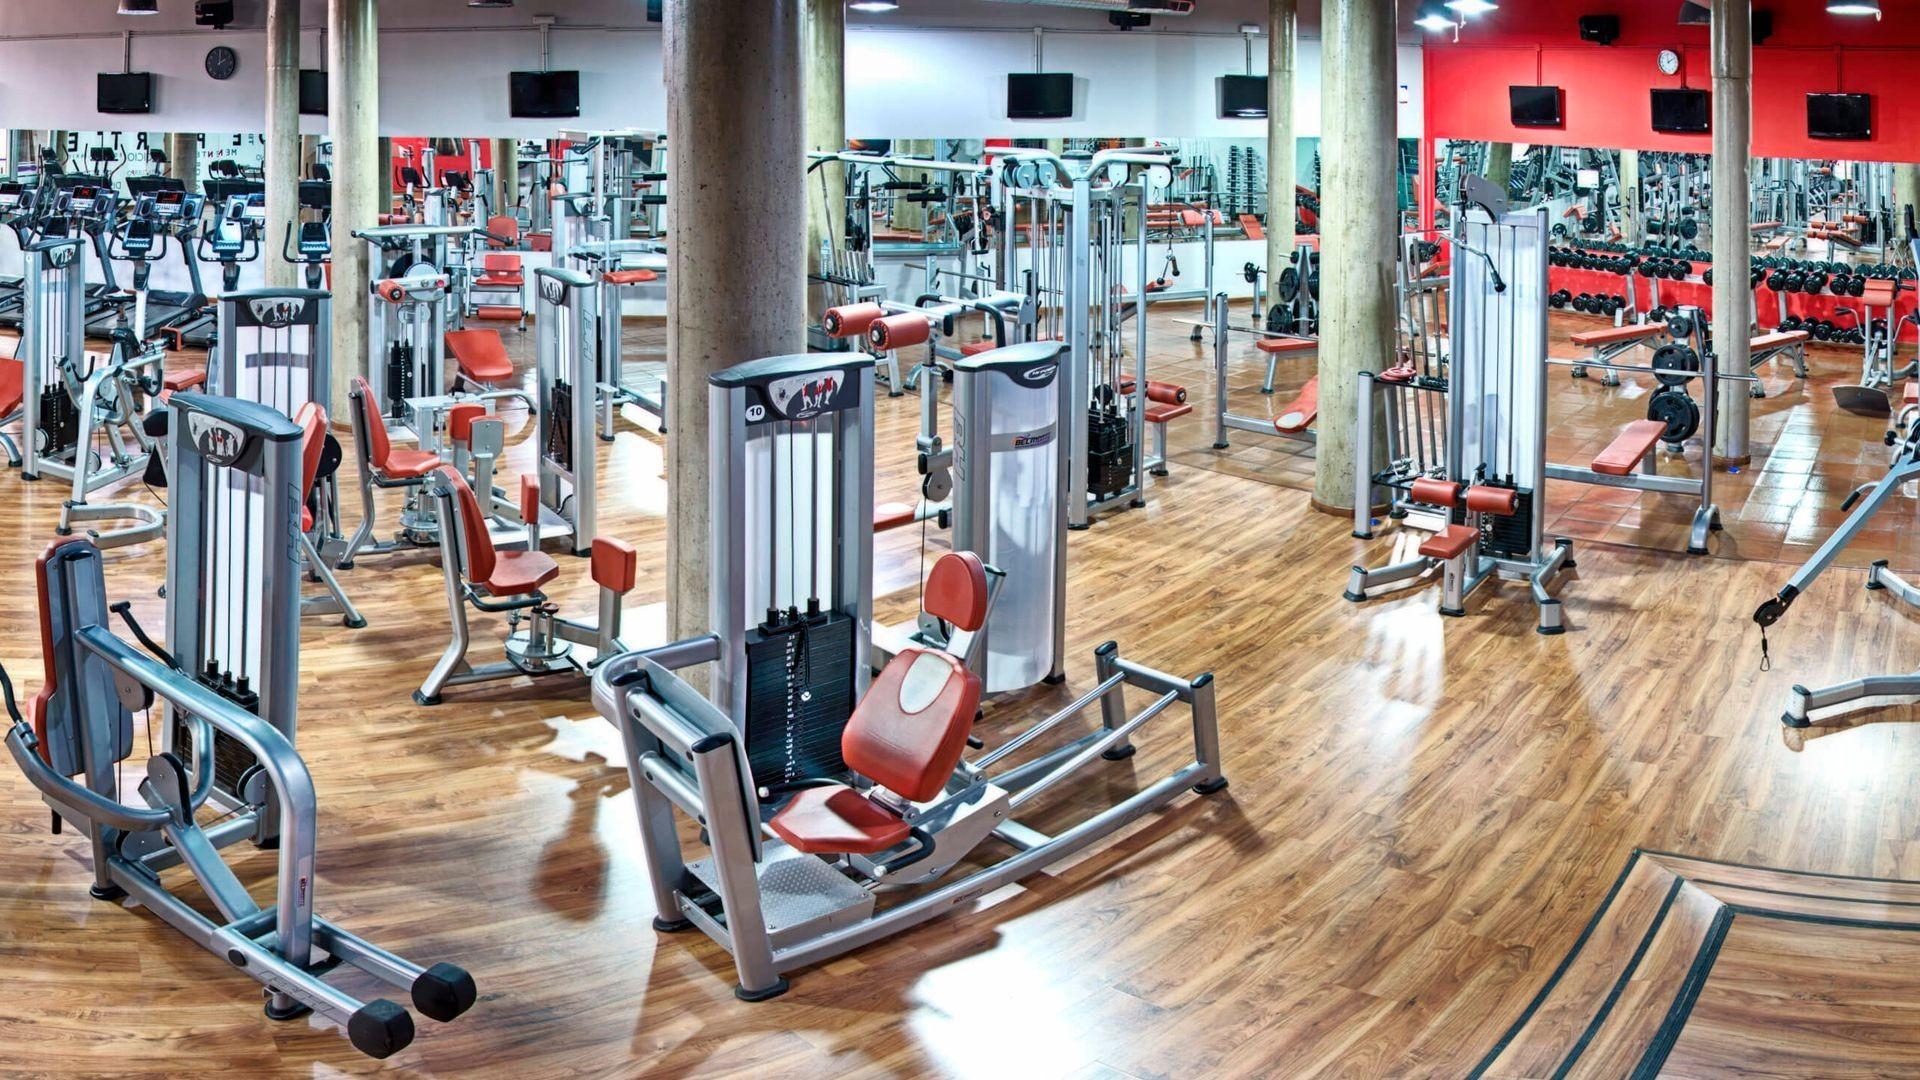 gimnasio musculacion Almeria